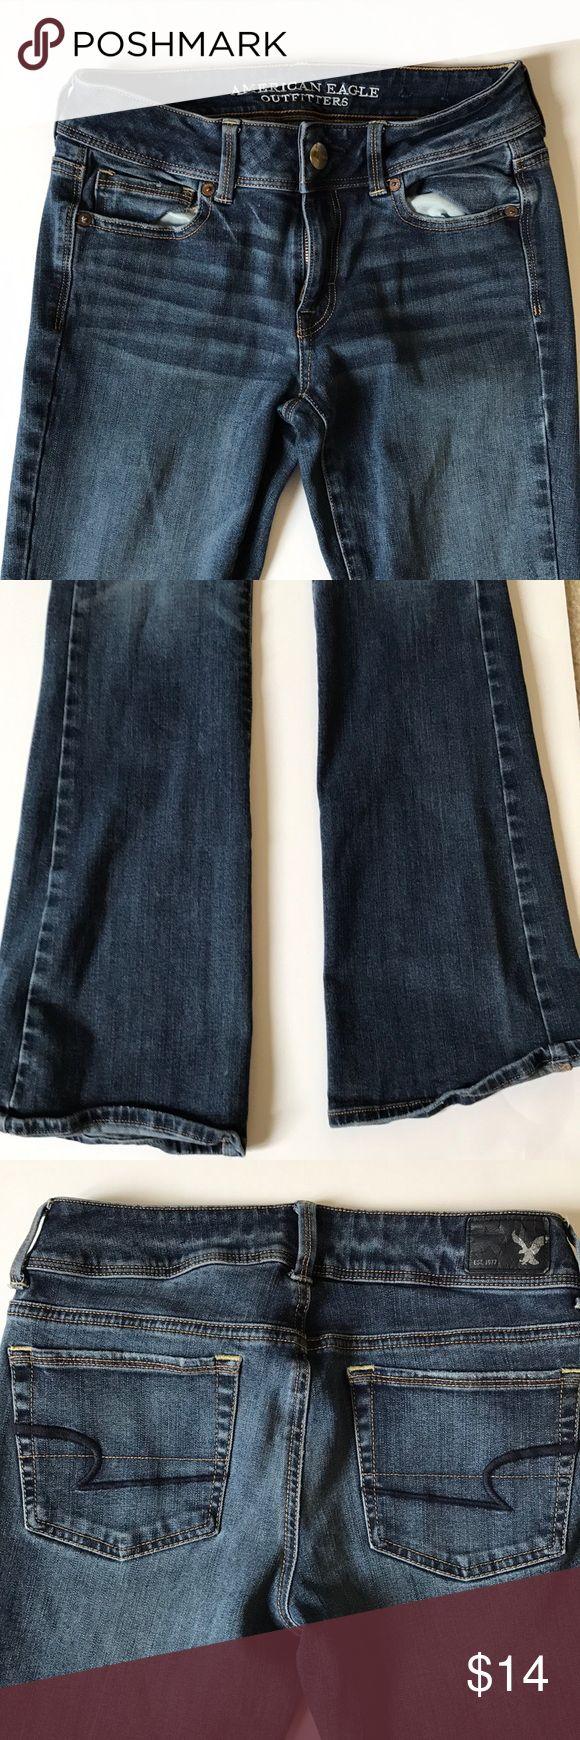 💕NWOT💕American Eagle Super Stretch Jeans Size 2 💕NWOT💕Bootcut Super Stretch American Eagle Jeans Size 2 American Eagle Outfitters Jeans Boot Cut